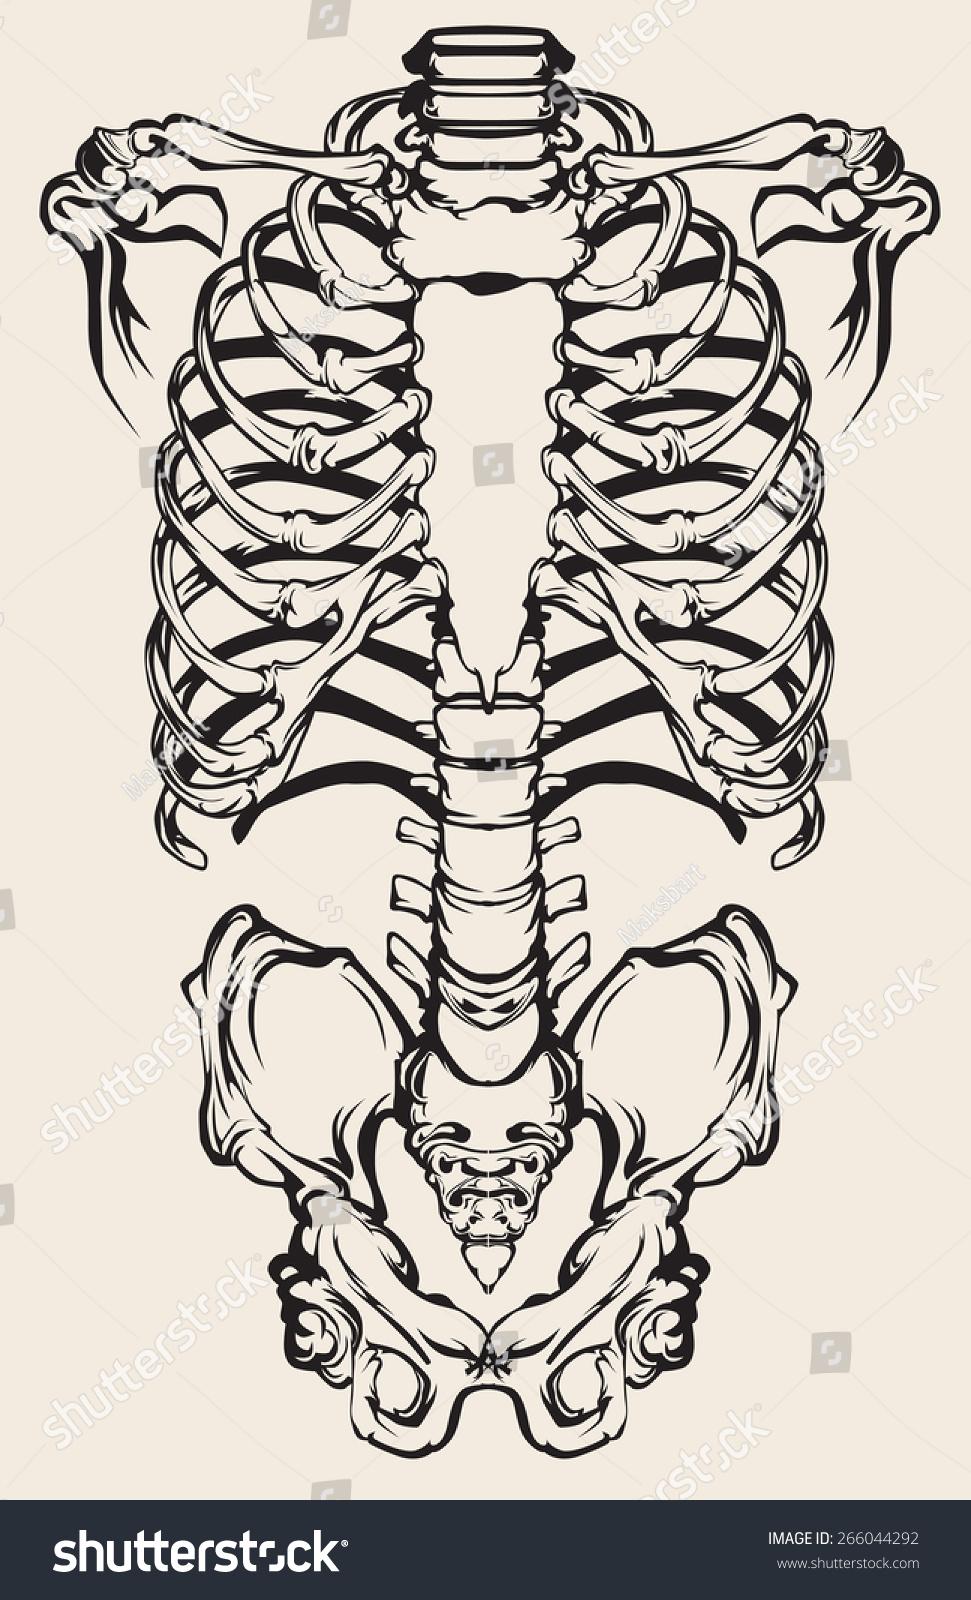 Detailed Anatomical Illustration Human Skeleton Stock Vector